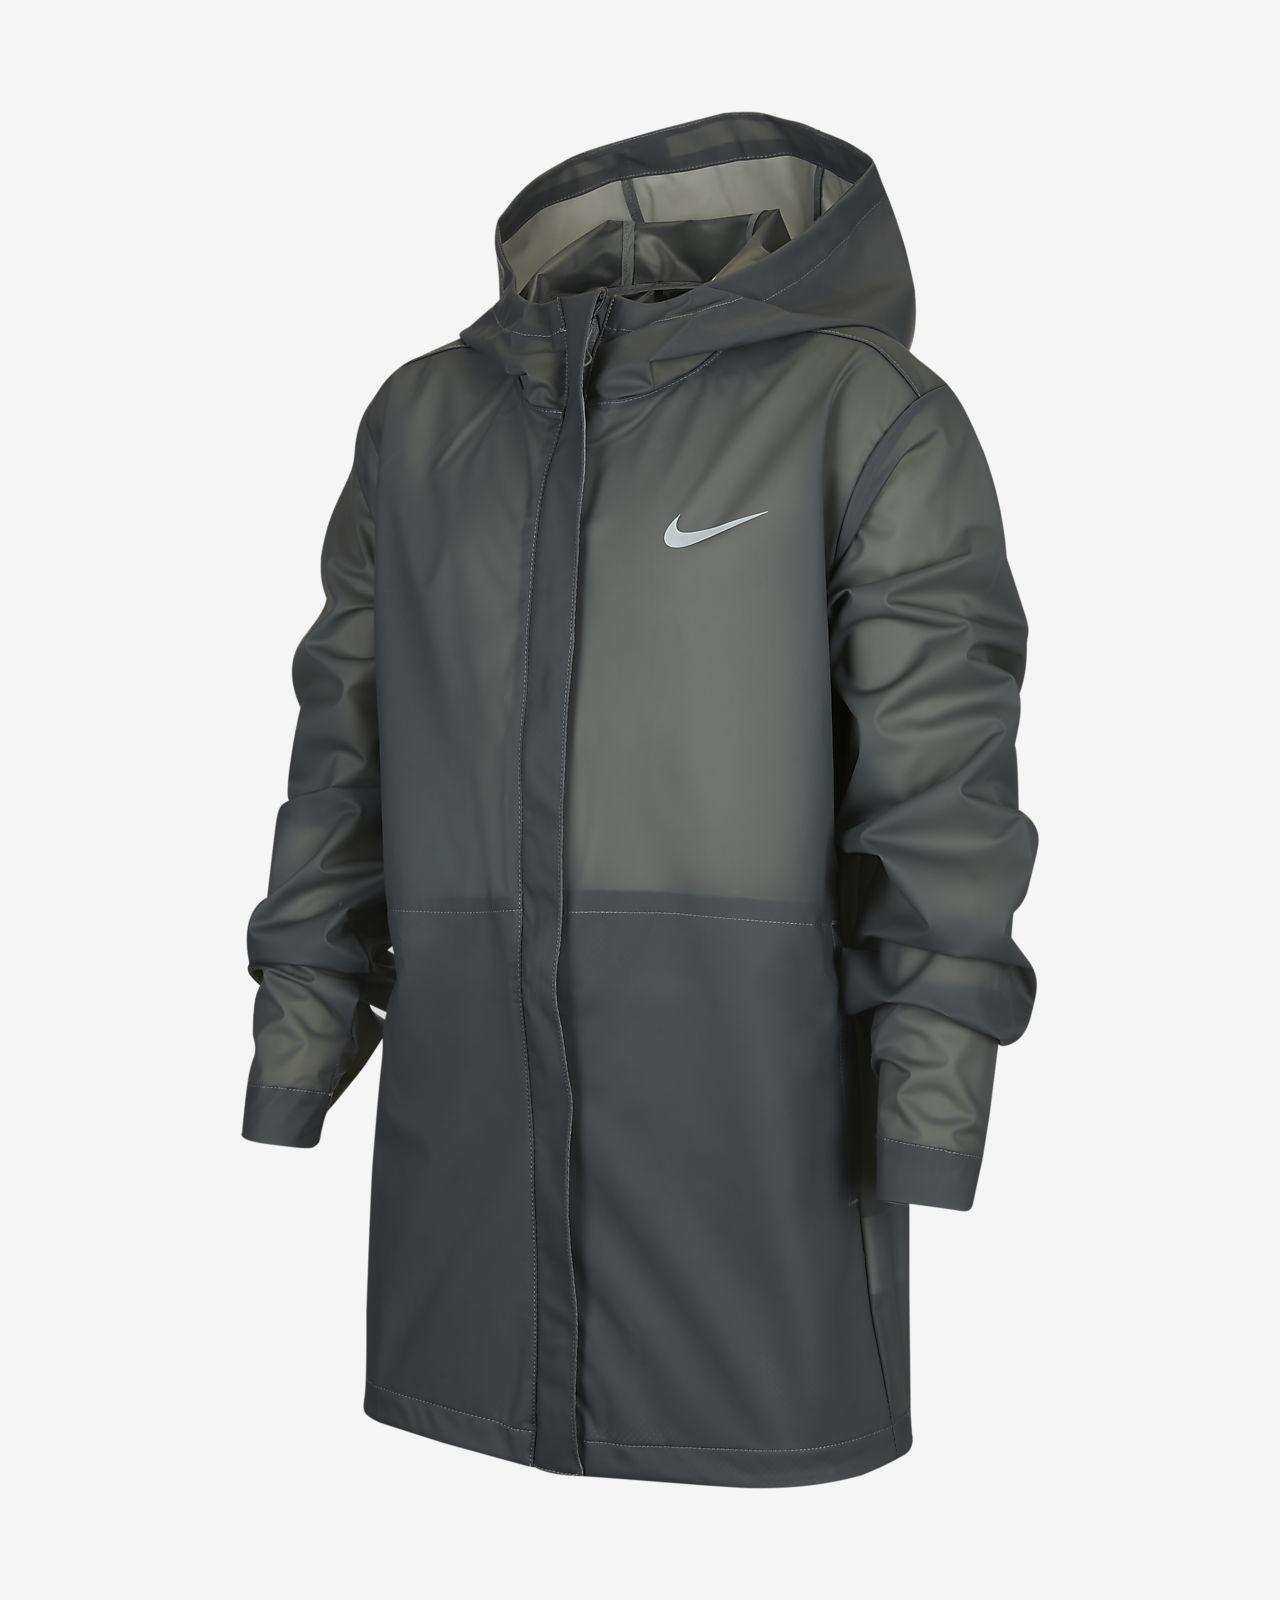 Nike Sportswear Tech Pack 大童(男孩)夹克